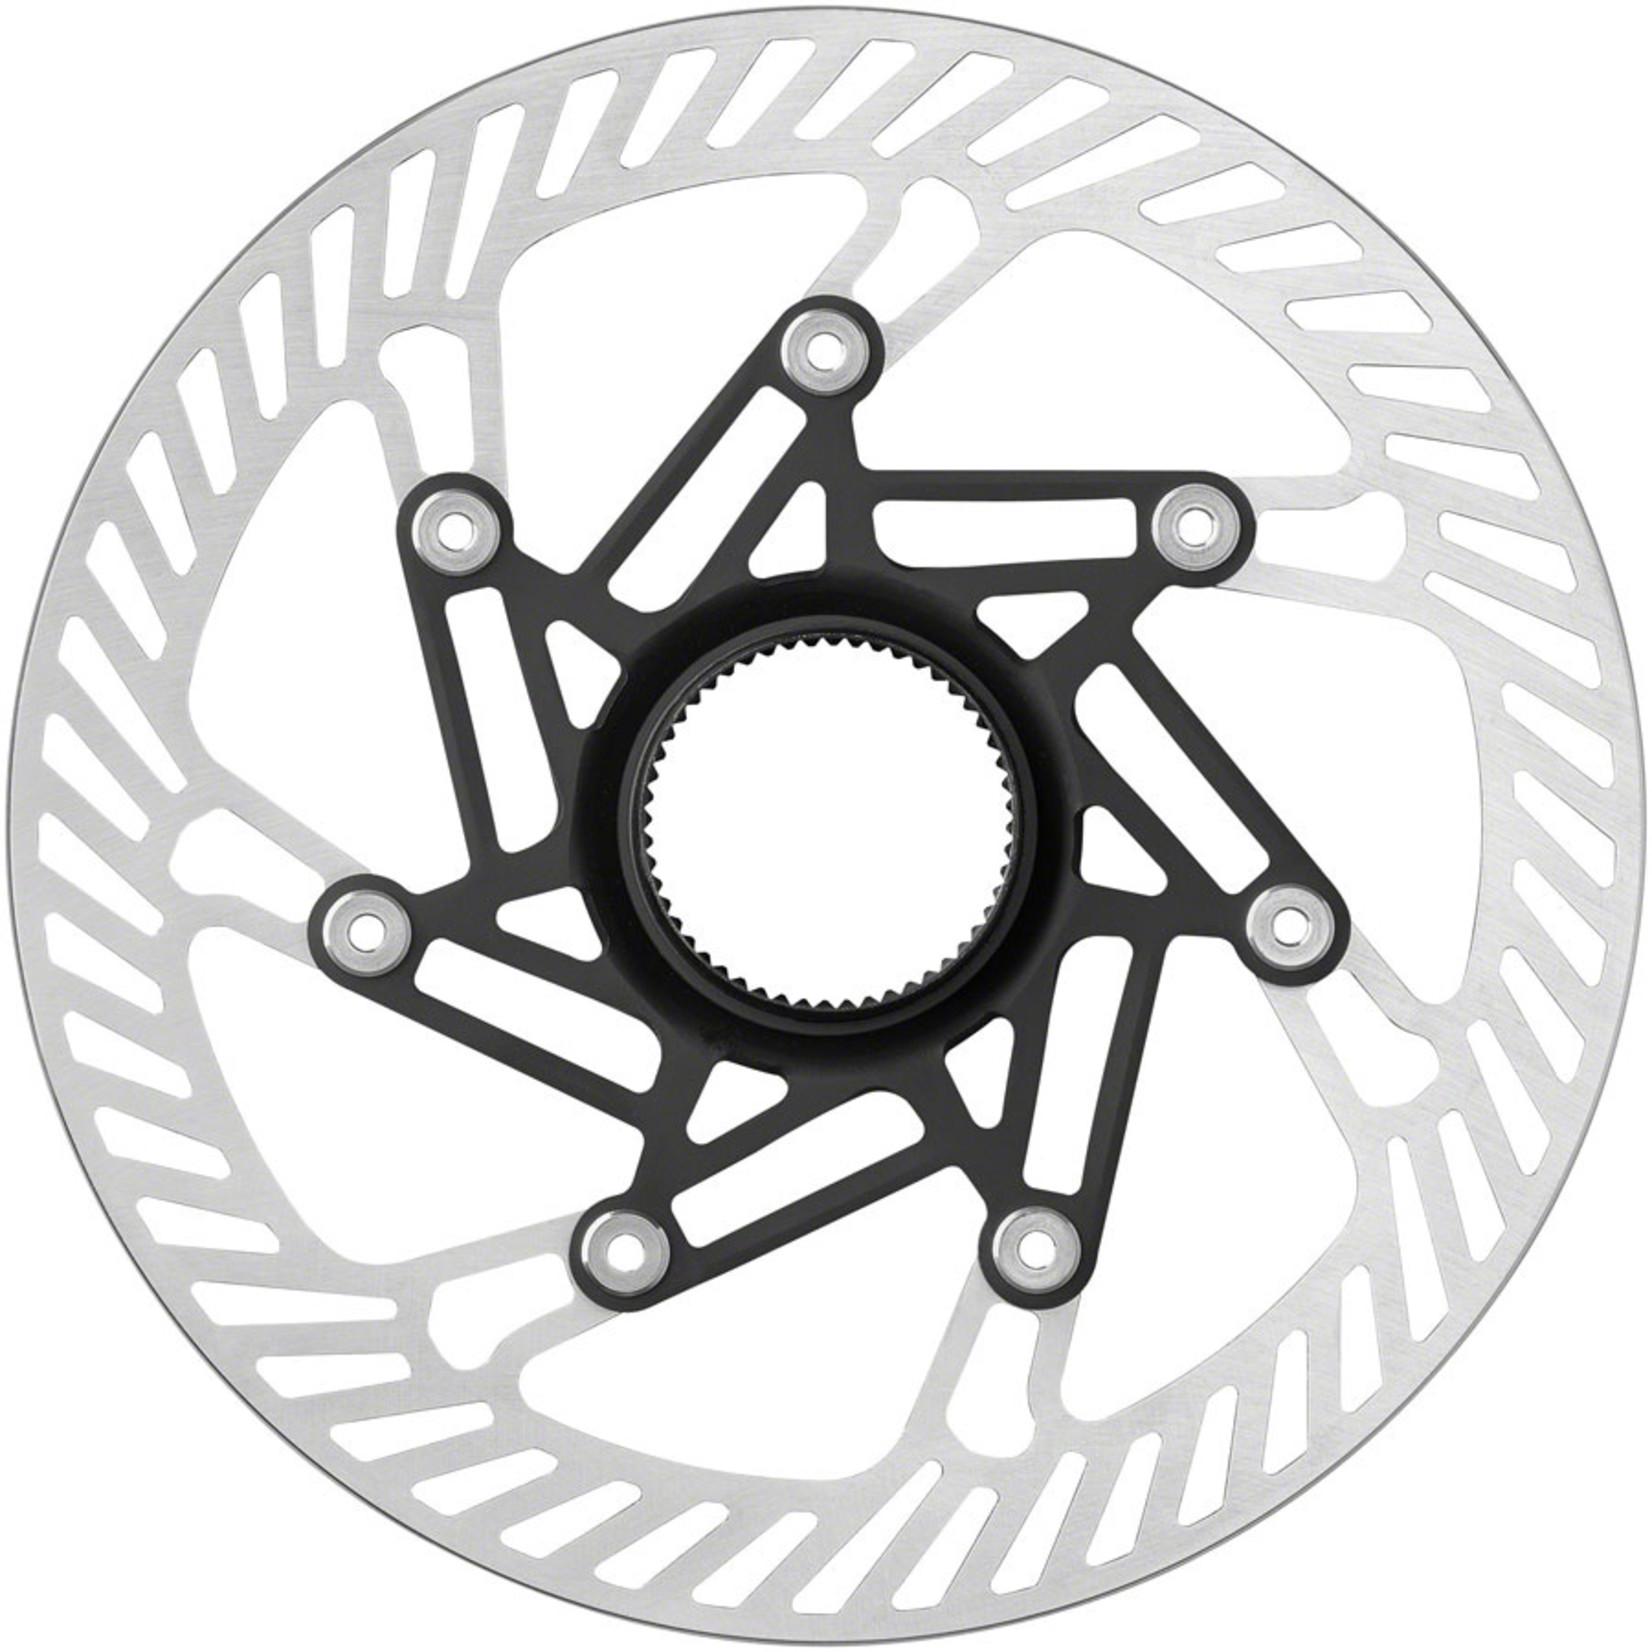 Campagnolo Campagnolo, AFS Spider Rotor, 160mm, Center Lock